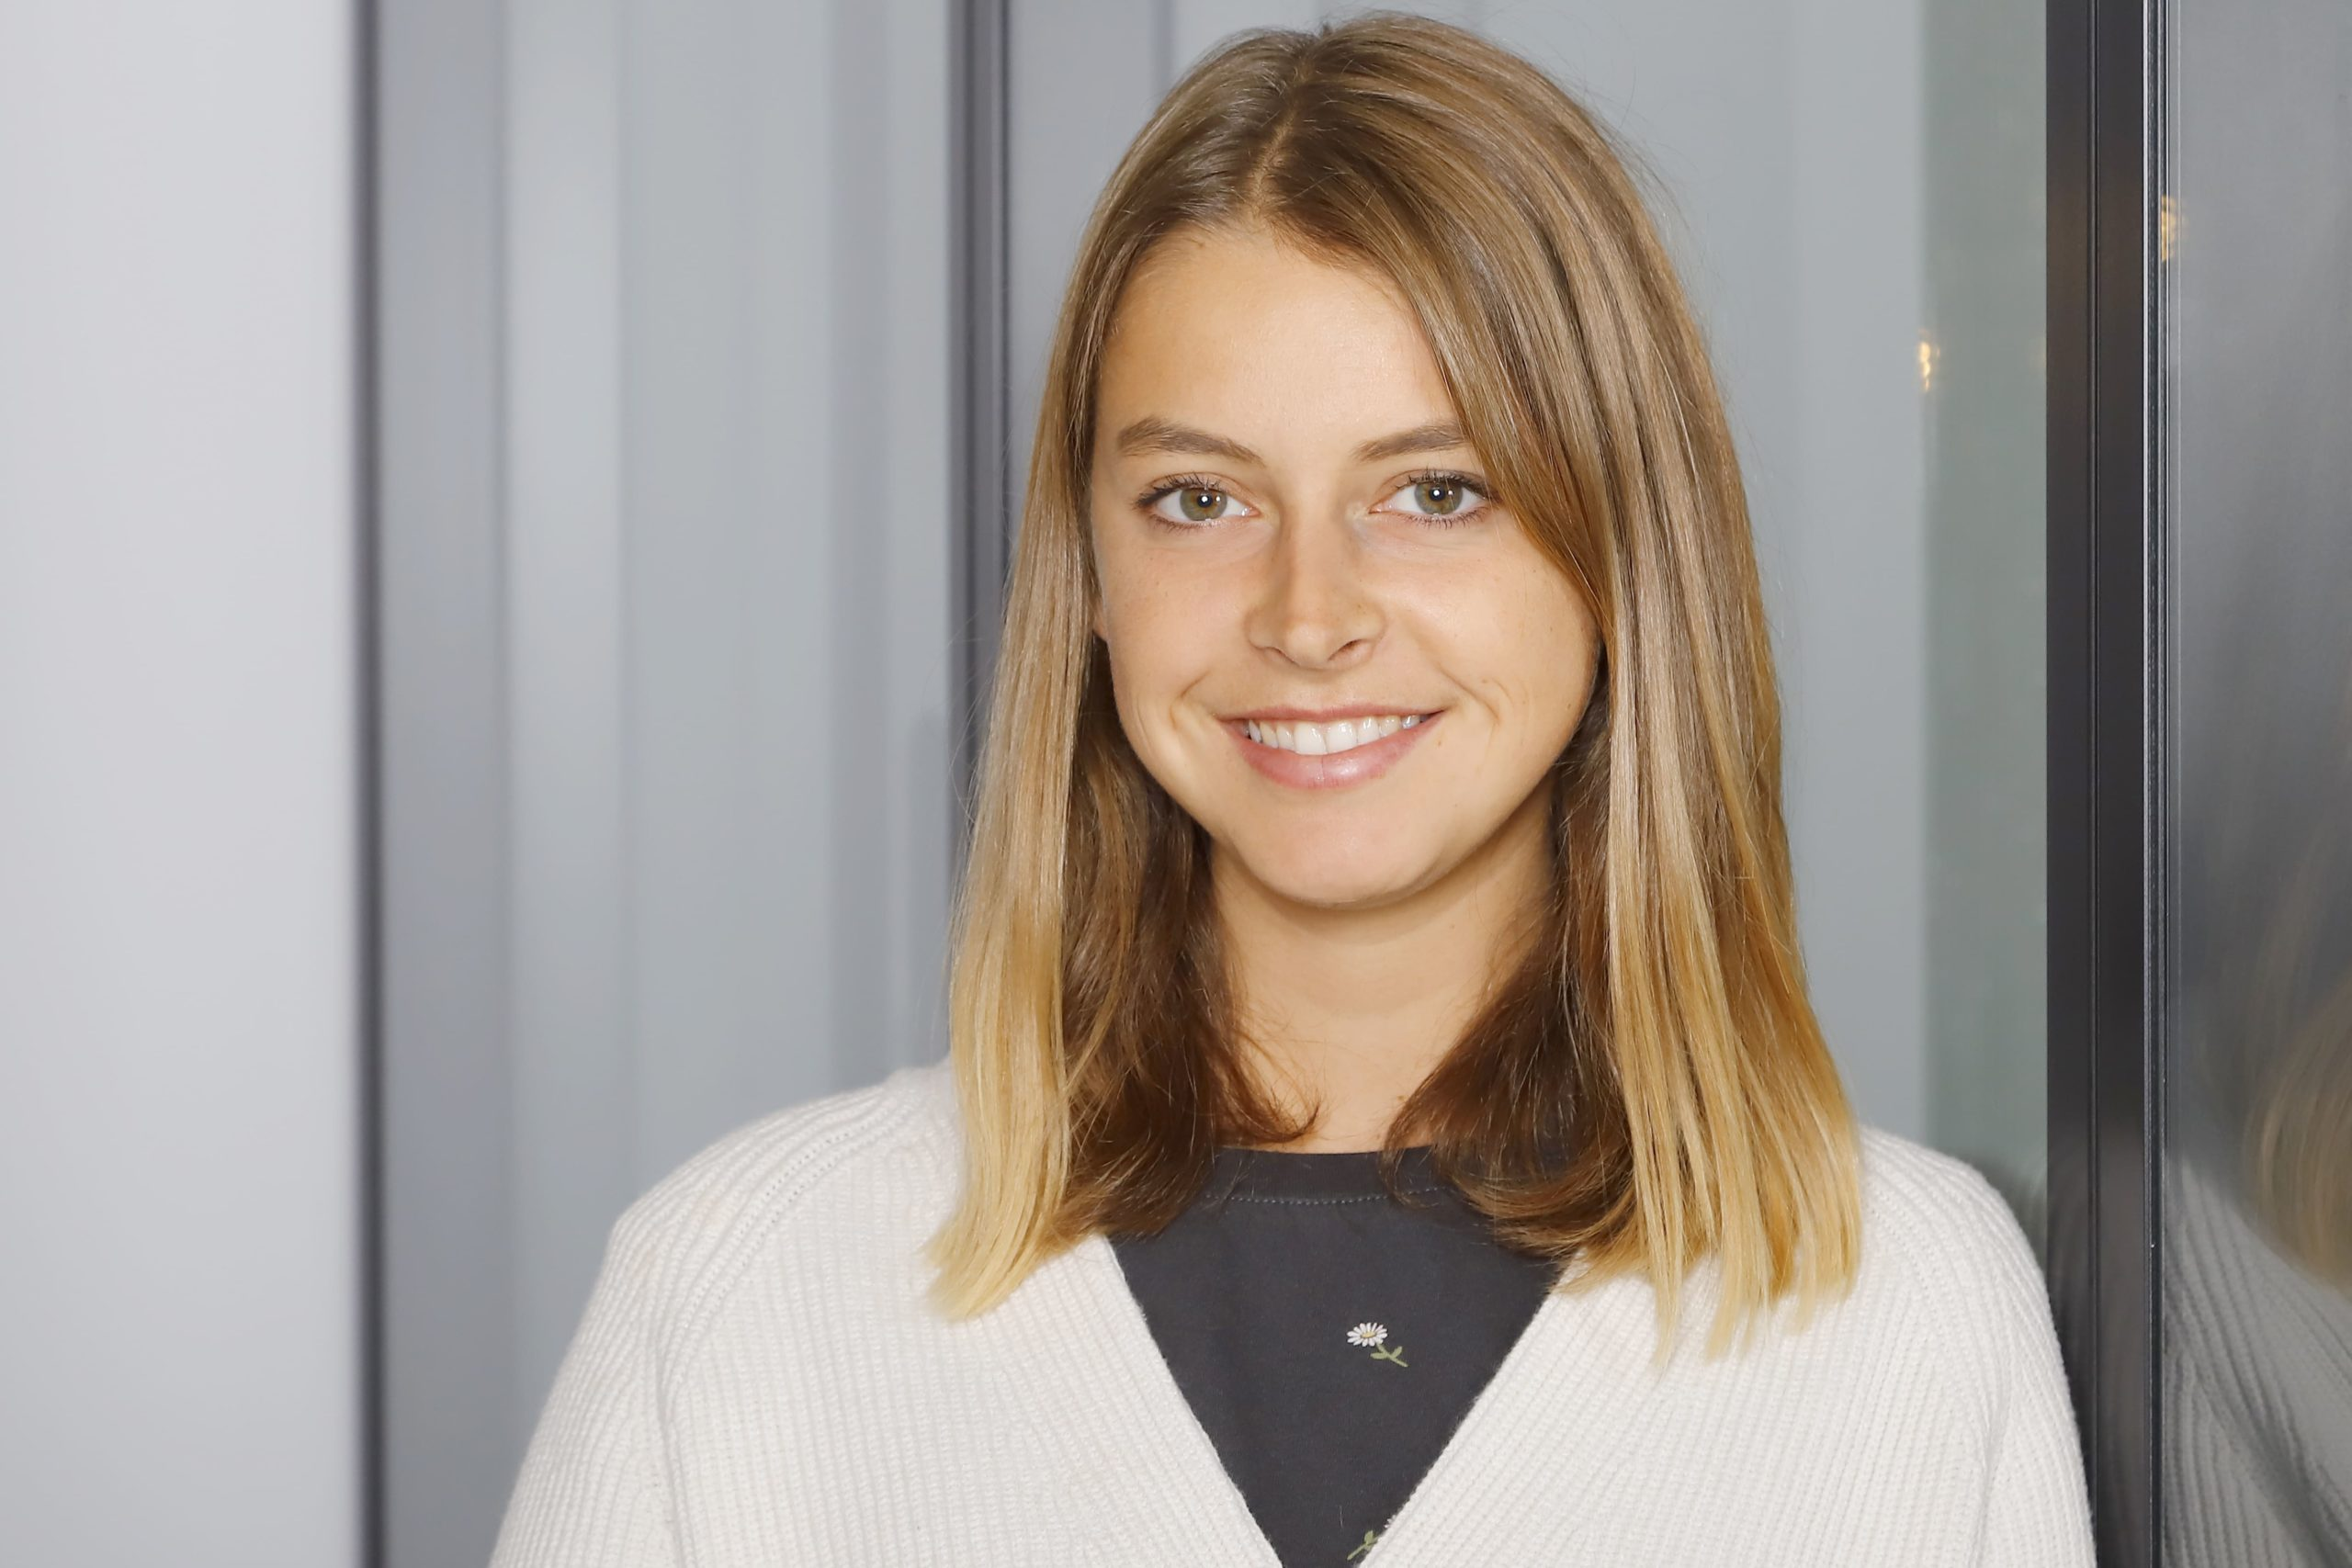 Co founder of wonda swim Teresa Brouwers